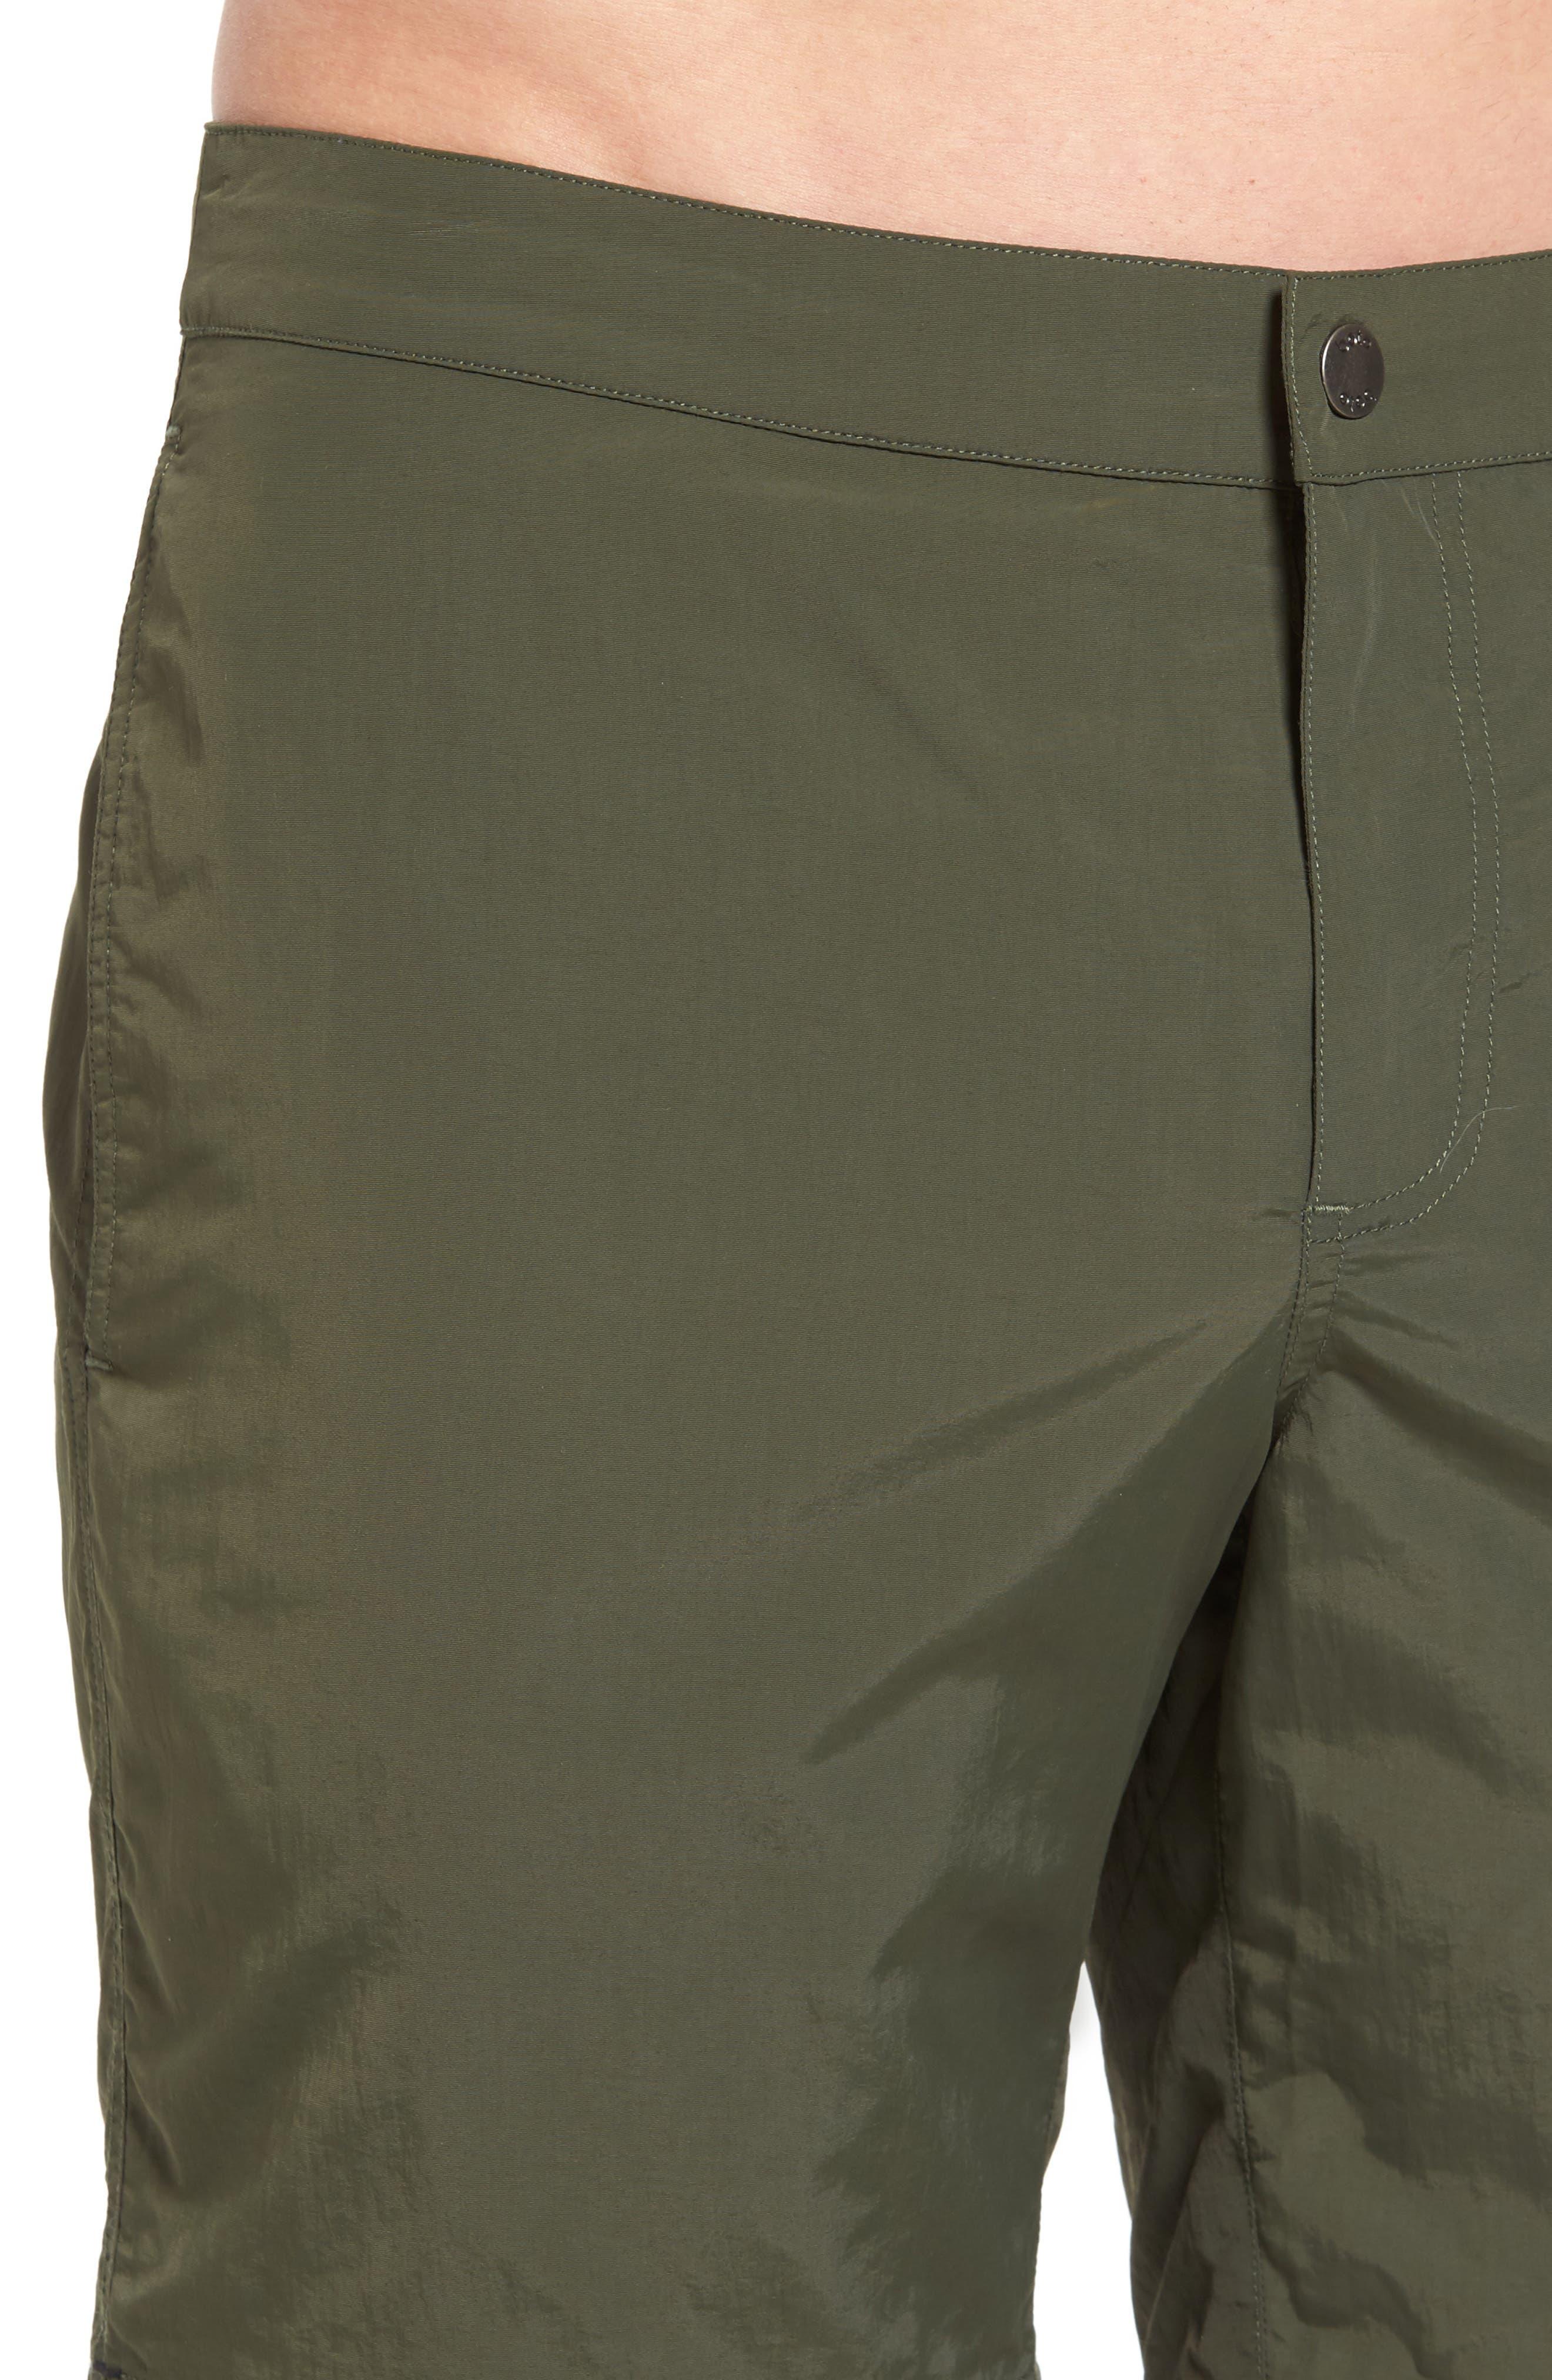 'Aruba - Island' Tailored Fit 8.5 Inch Board Shorts,                             Alternate thumbnail 17, color,